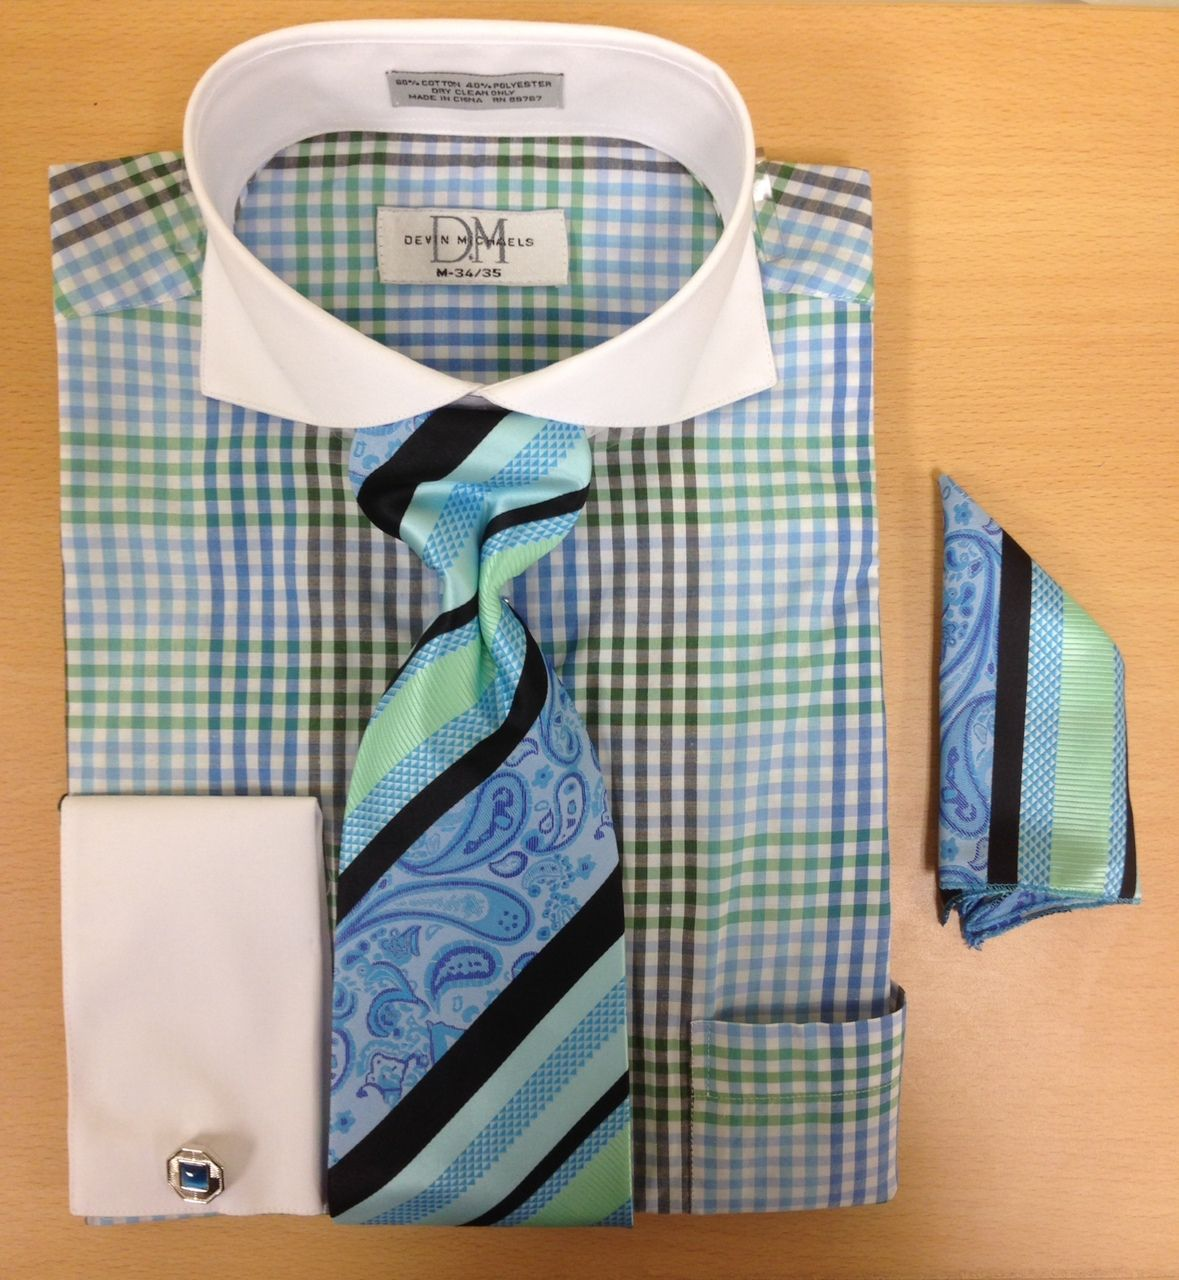 Men's Fashion Three-Tone Gingham Pattern Cufflink Dress Shirt Set - Blue/Green/Black